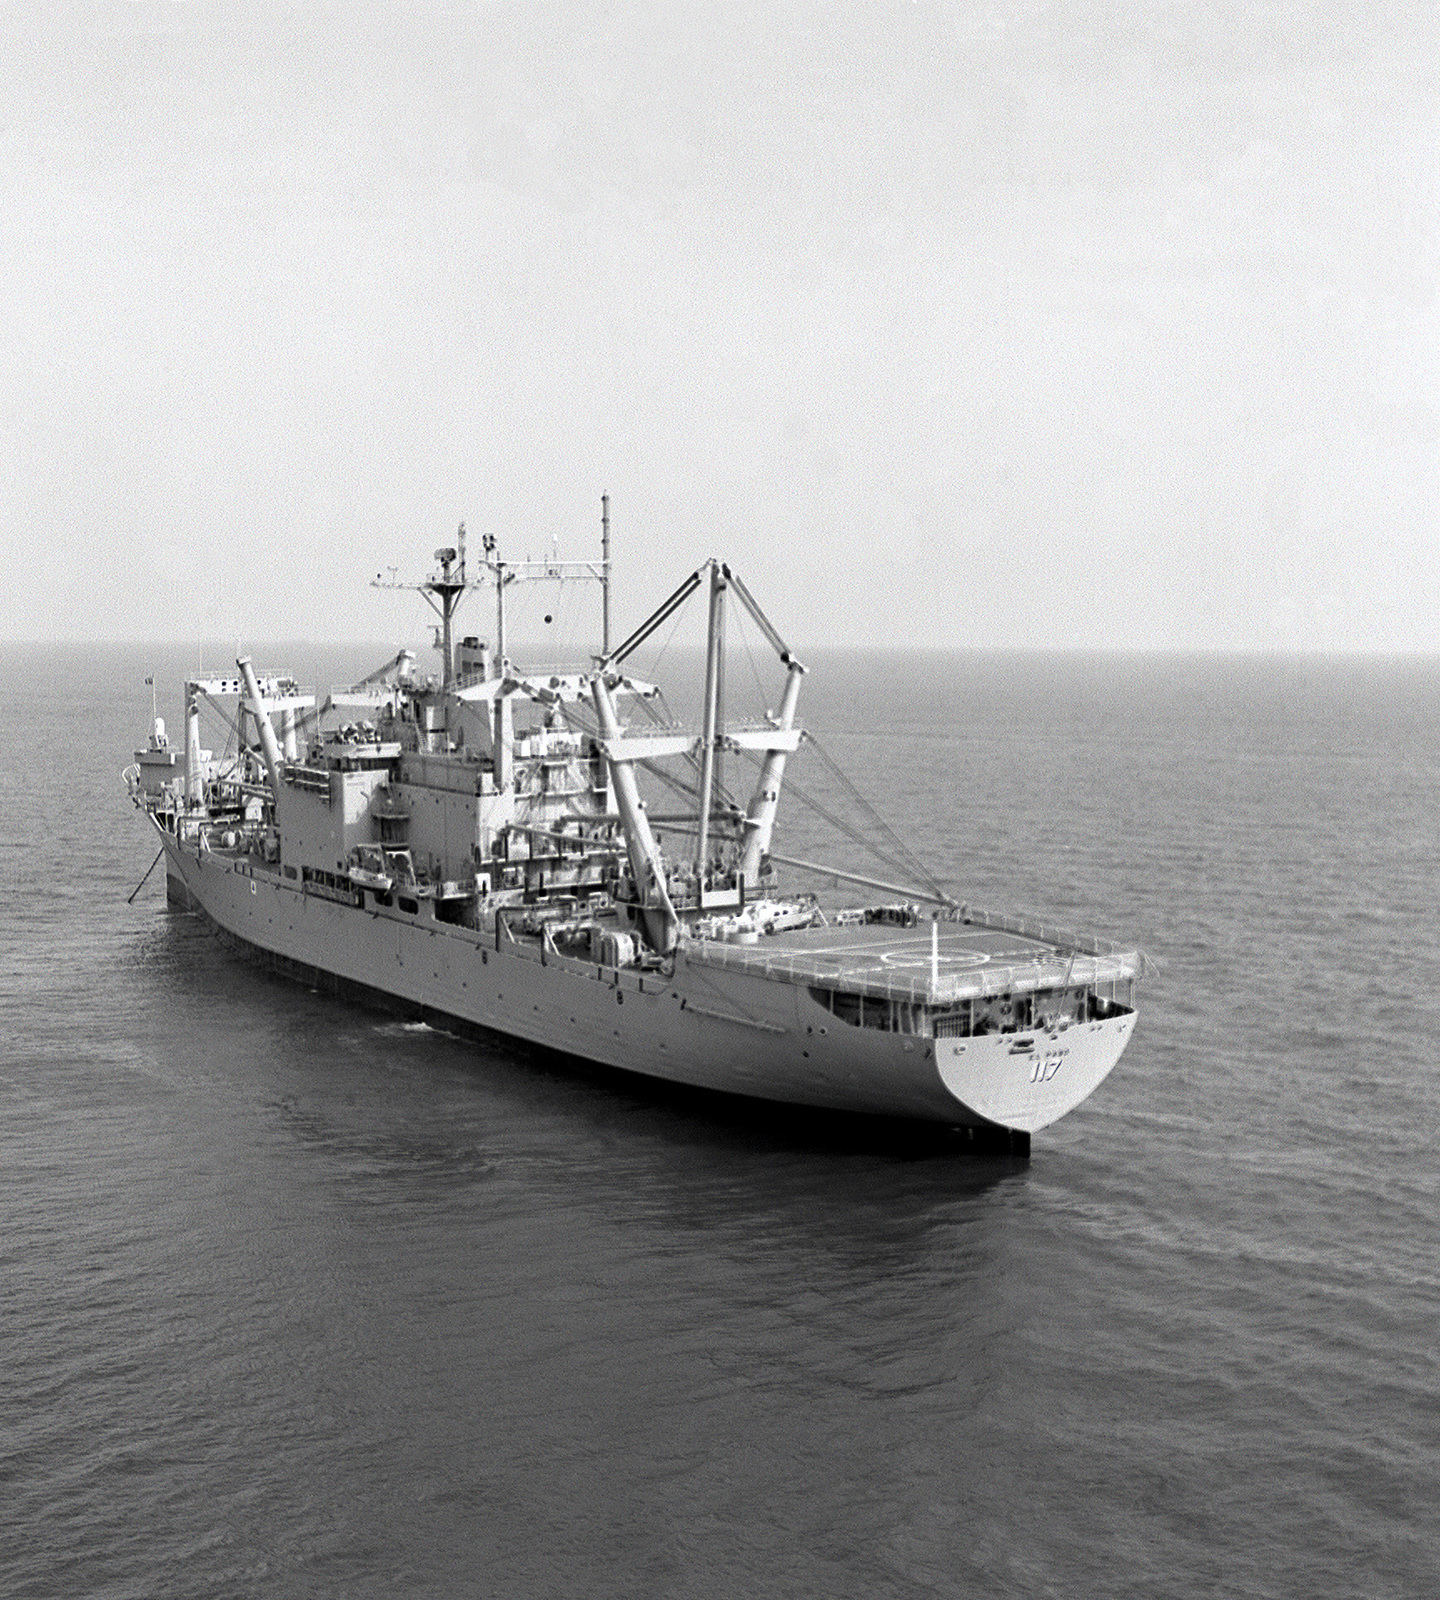 A port quarter view of the amphibious cargo ship USS EL PASO (LKA-117) at anchor off the Virginia Capes